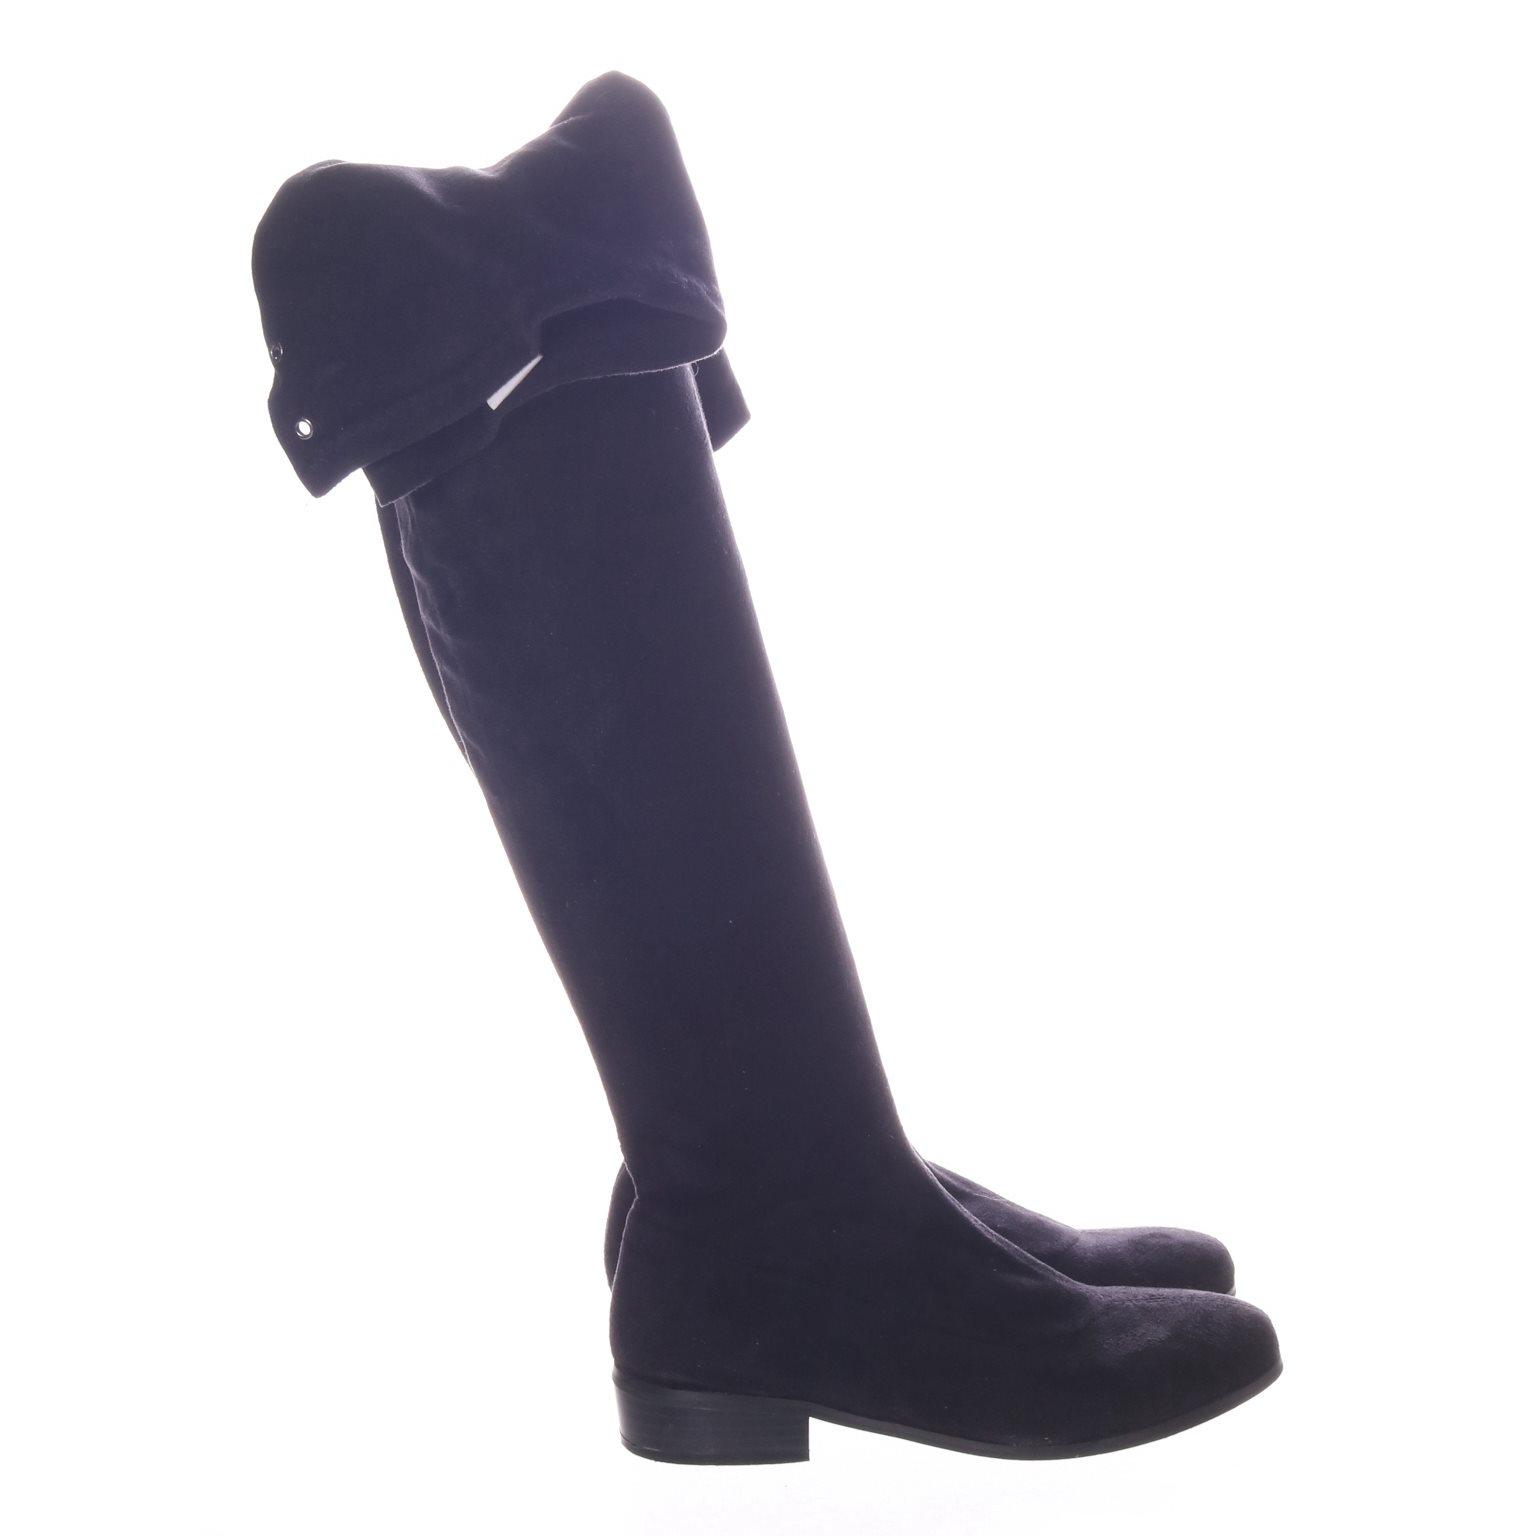 3aaeb59e091 NLY Shoes, Stövlar, Strl: 37, Svart, Mock.. (334114193) ᐈ Sellpy på ...